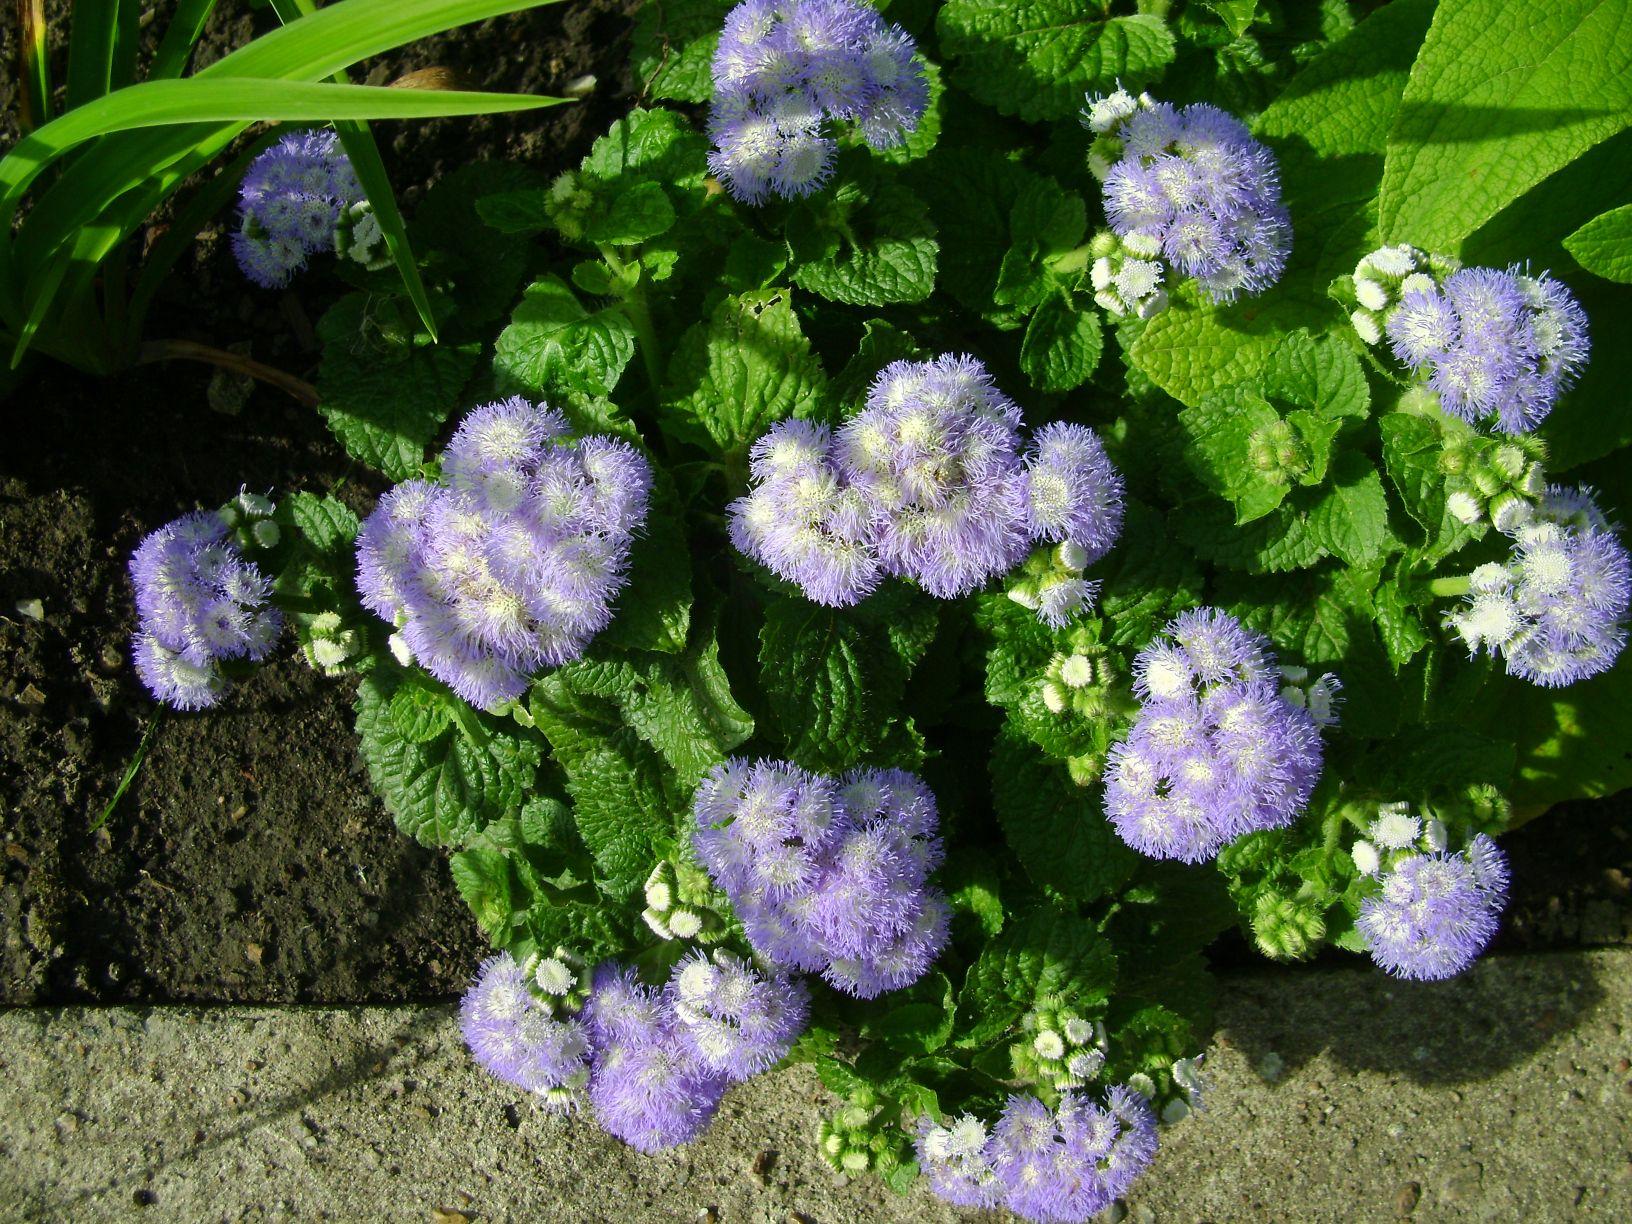 осот фото растение